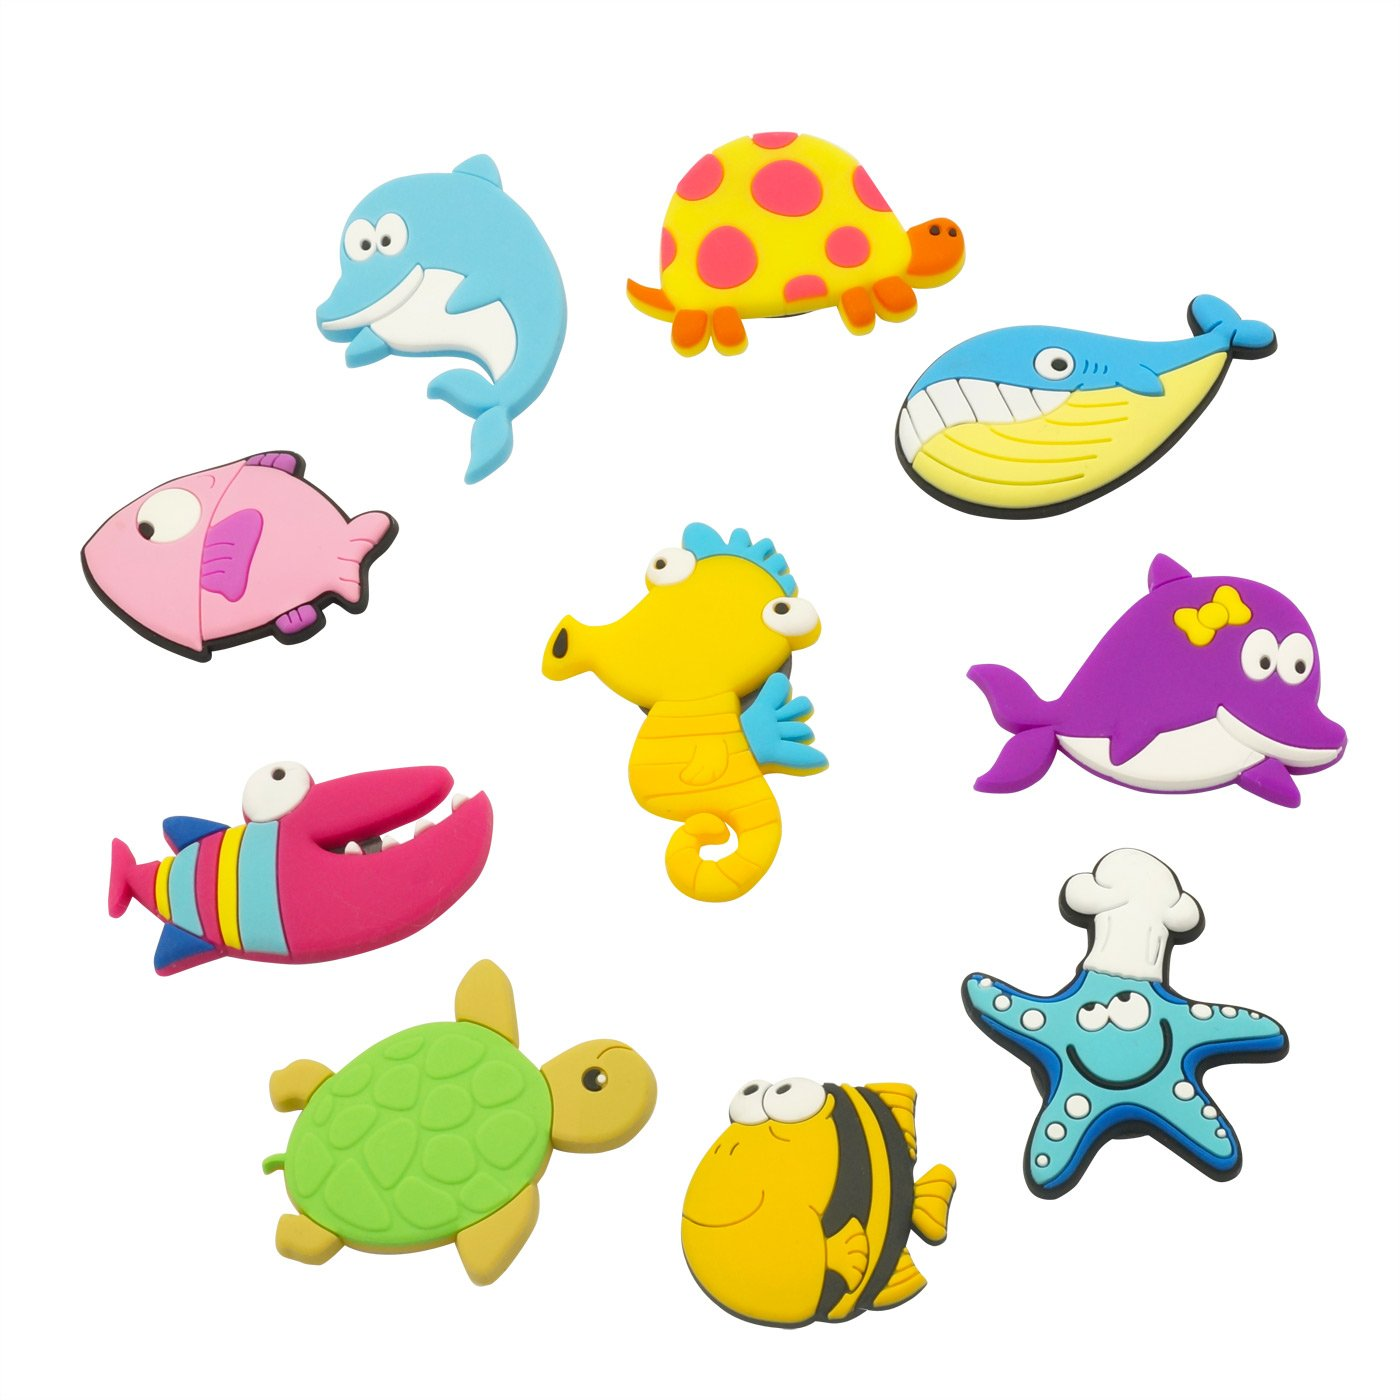 Fridge Magnets for Toddlers Under Sea Ocean Animal Magnets Cartoon Magnetic Fridge Funky Toy for Kids